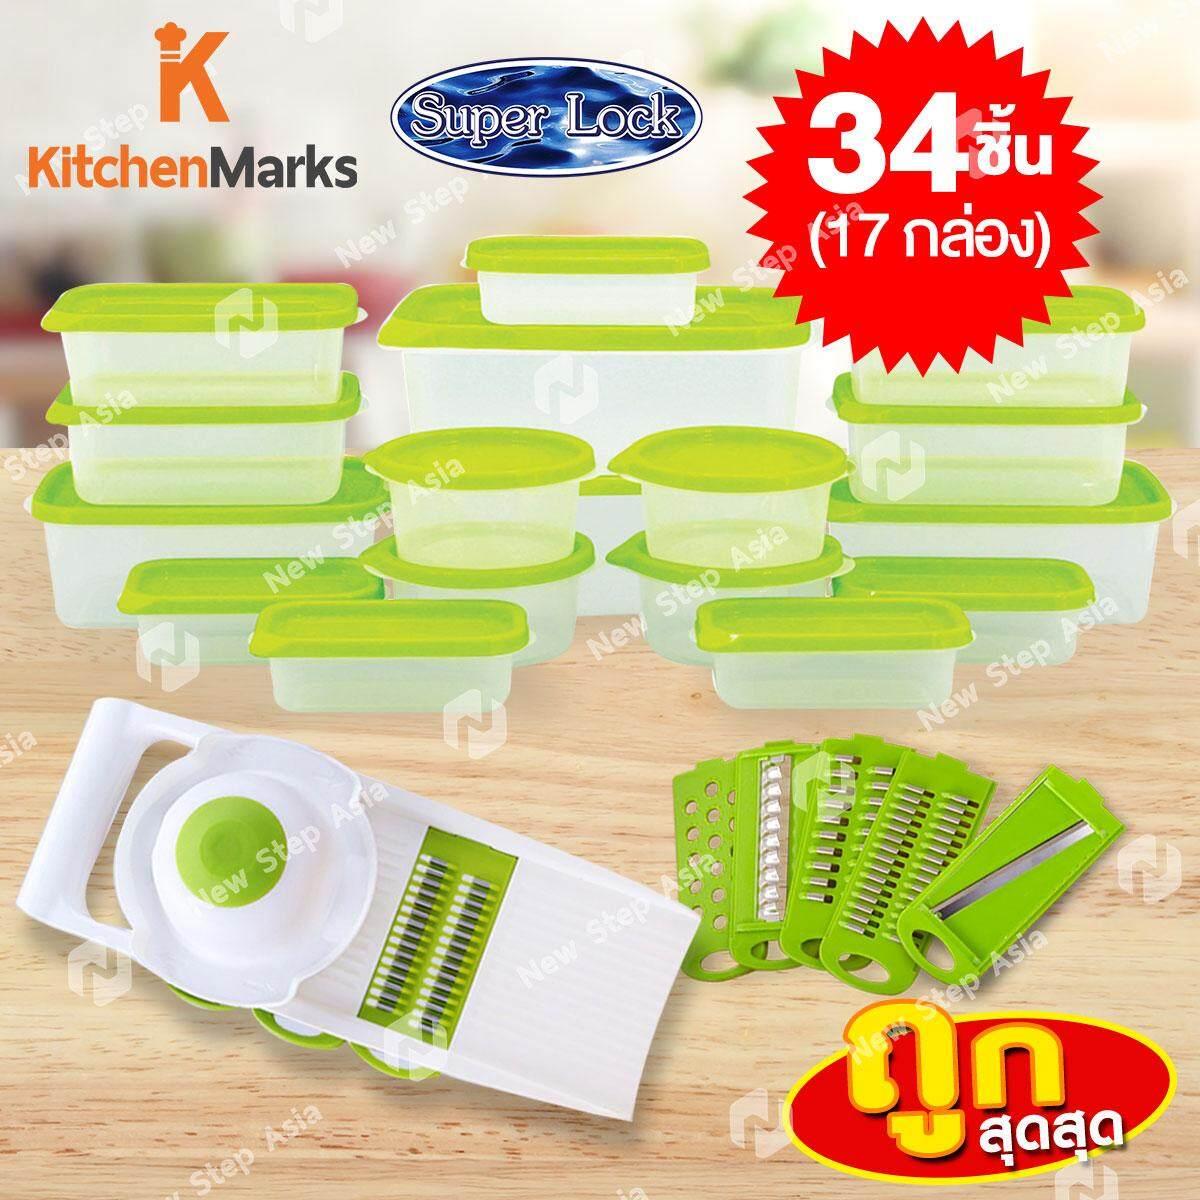 KitchenMarks ชุดสไลด์ผักผลไม้ ชุดมีดหั่นผัก แถมฟรี! กล่องถนอมอาหาร Super Lock 34 ชิ้น รวมฝา (17 กล่อง) ขนาดรวม 1,050 ml BPA-Free ป้องกันแบคทีเรีย เข้าไมโครเวฟได้ กล่องใส่อาหาร กล่องข้าว กล่องพลาสติก superlock slicers เครื่องหั่นผักผลไม้ new step asia